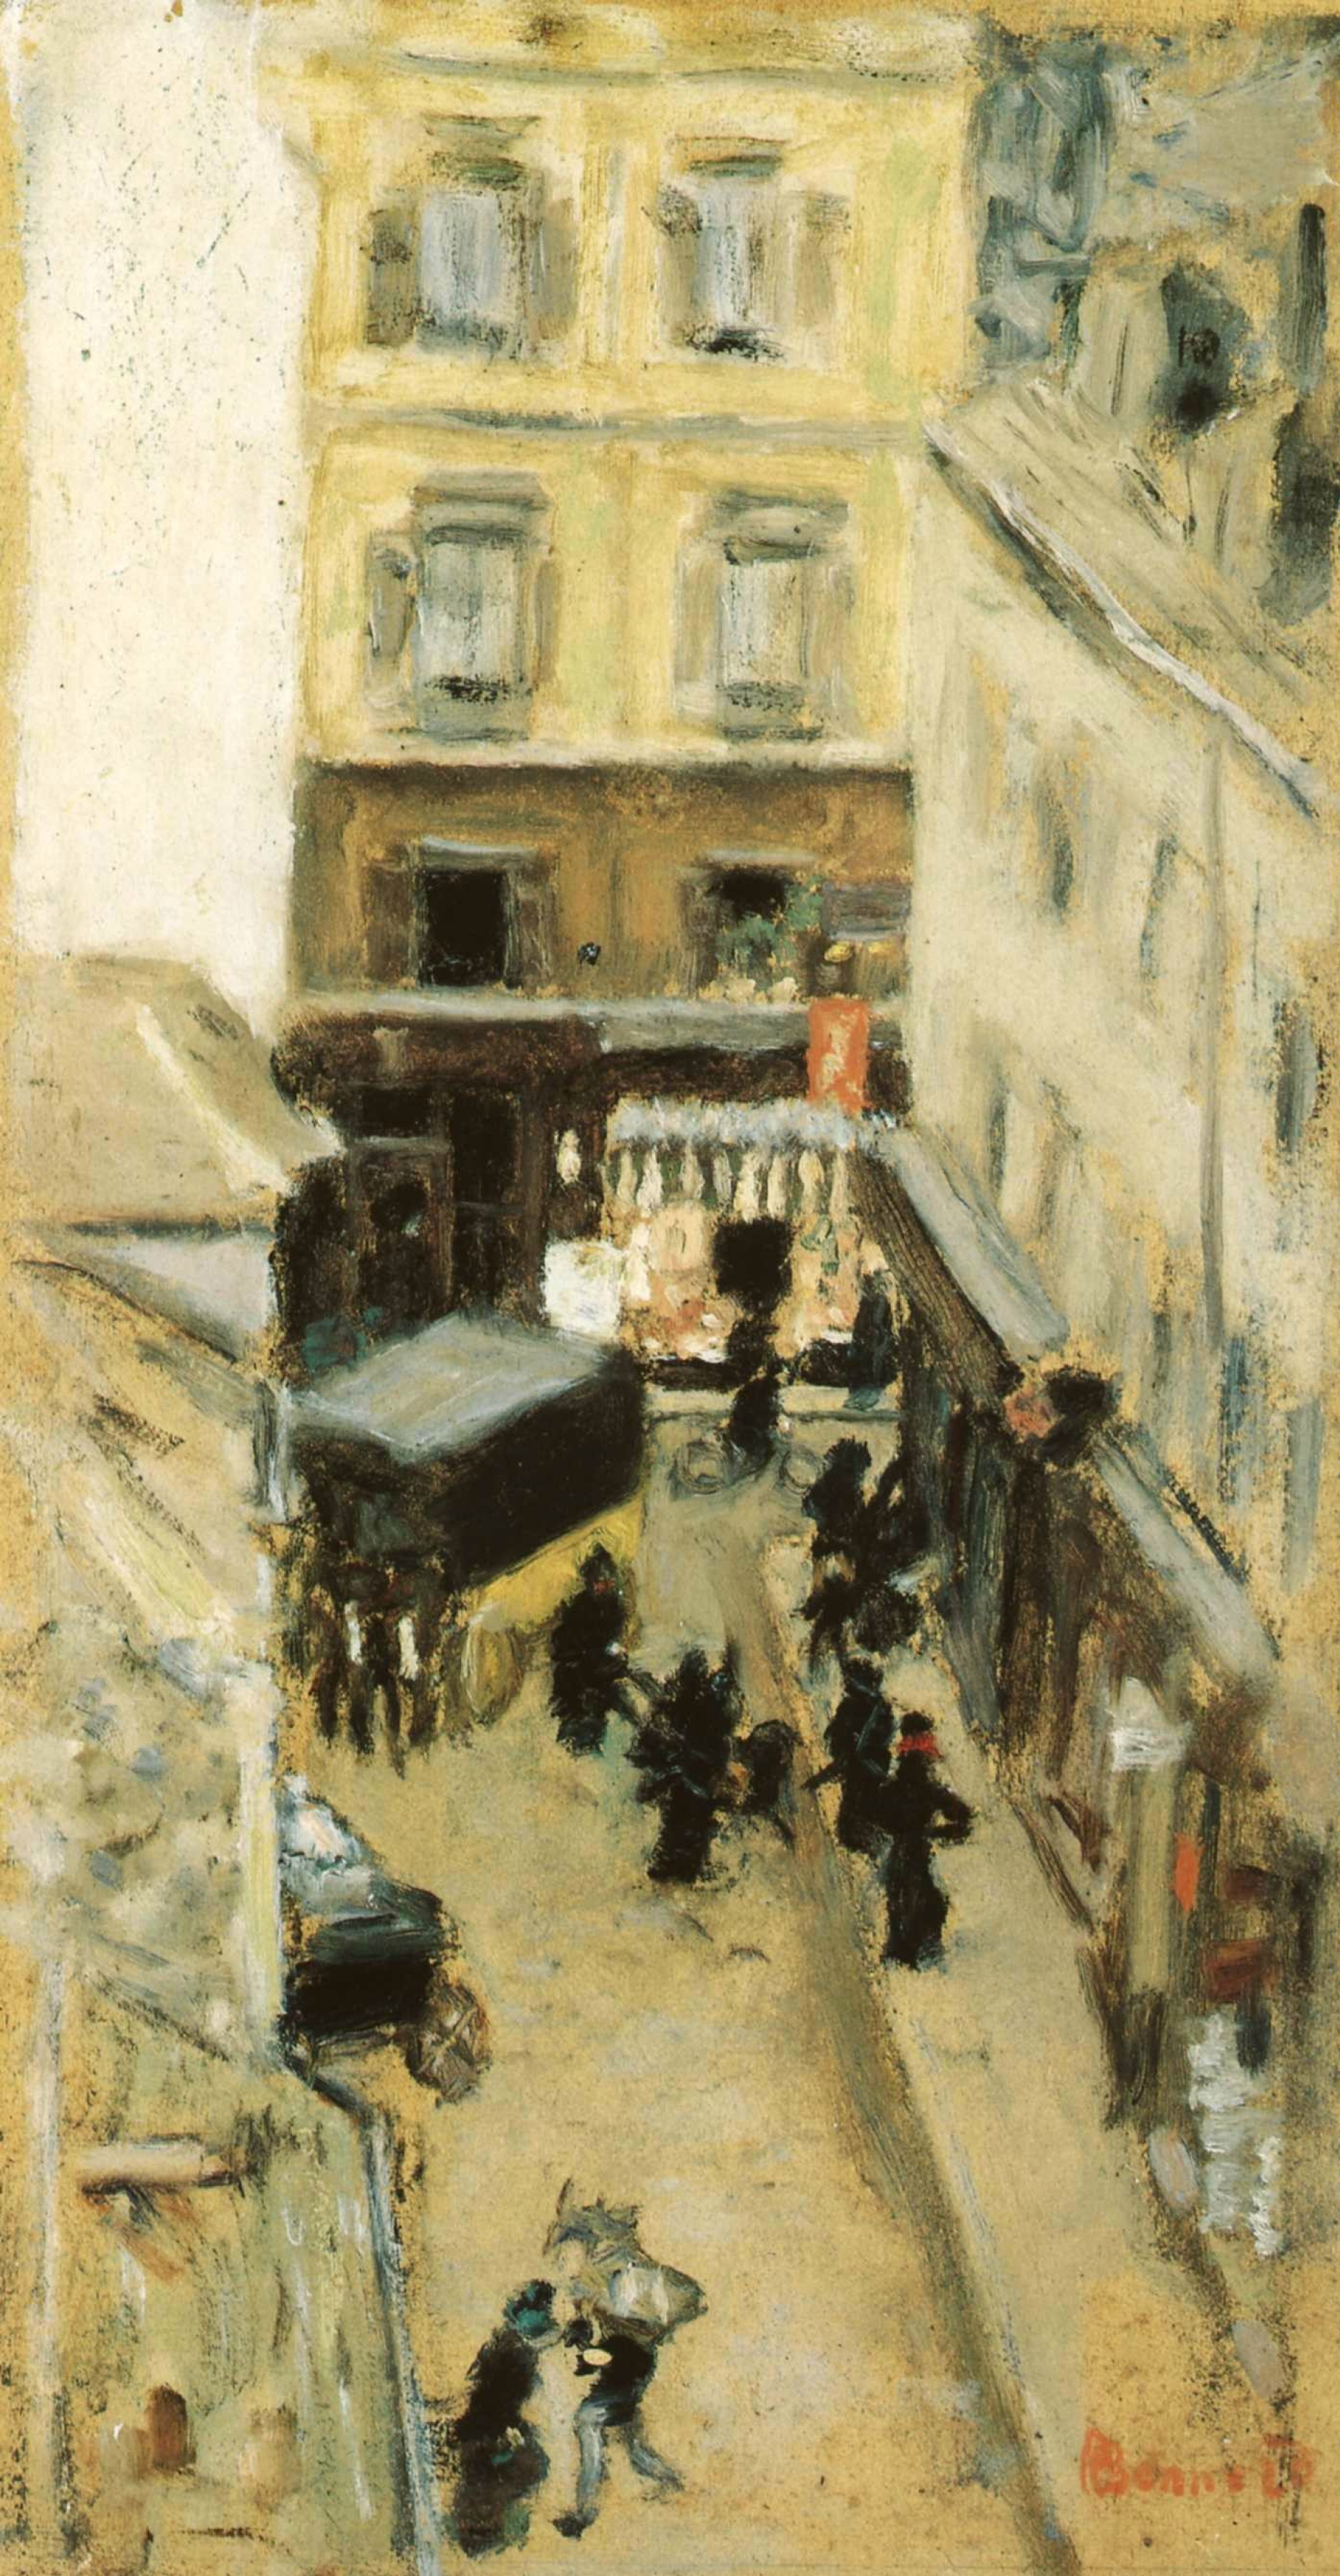 Пьер Боннар. Узкая улочка в Париже